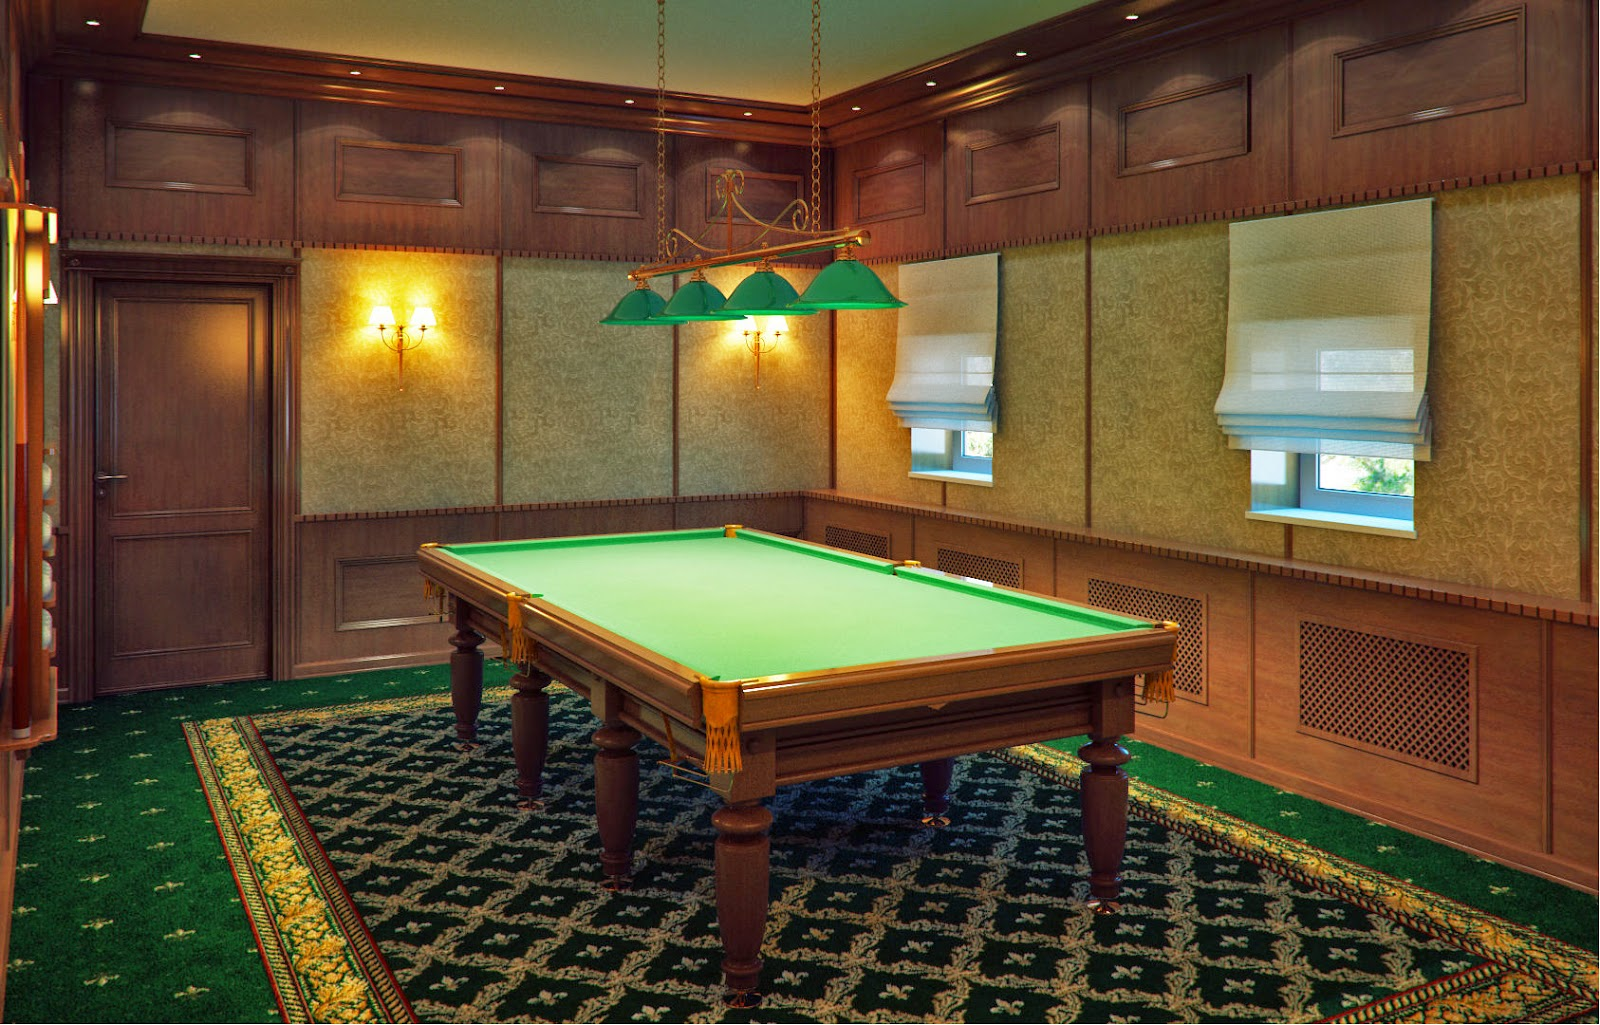 Willowbrook Park Billiard Table